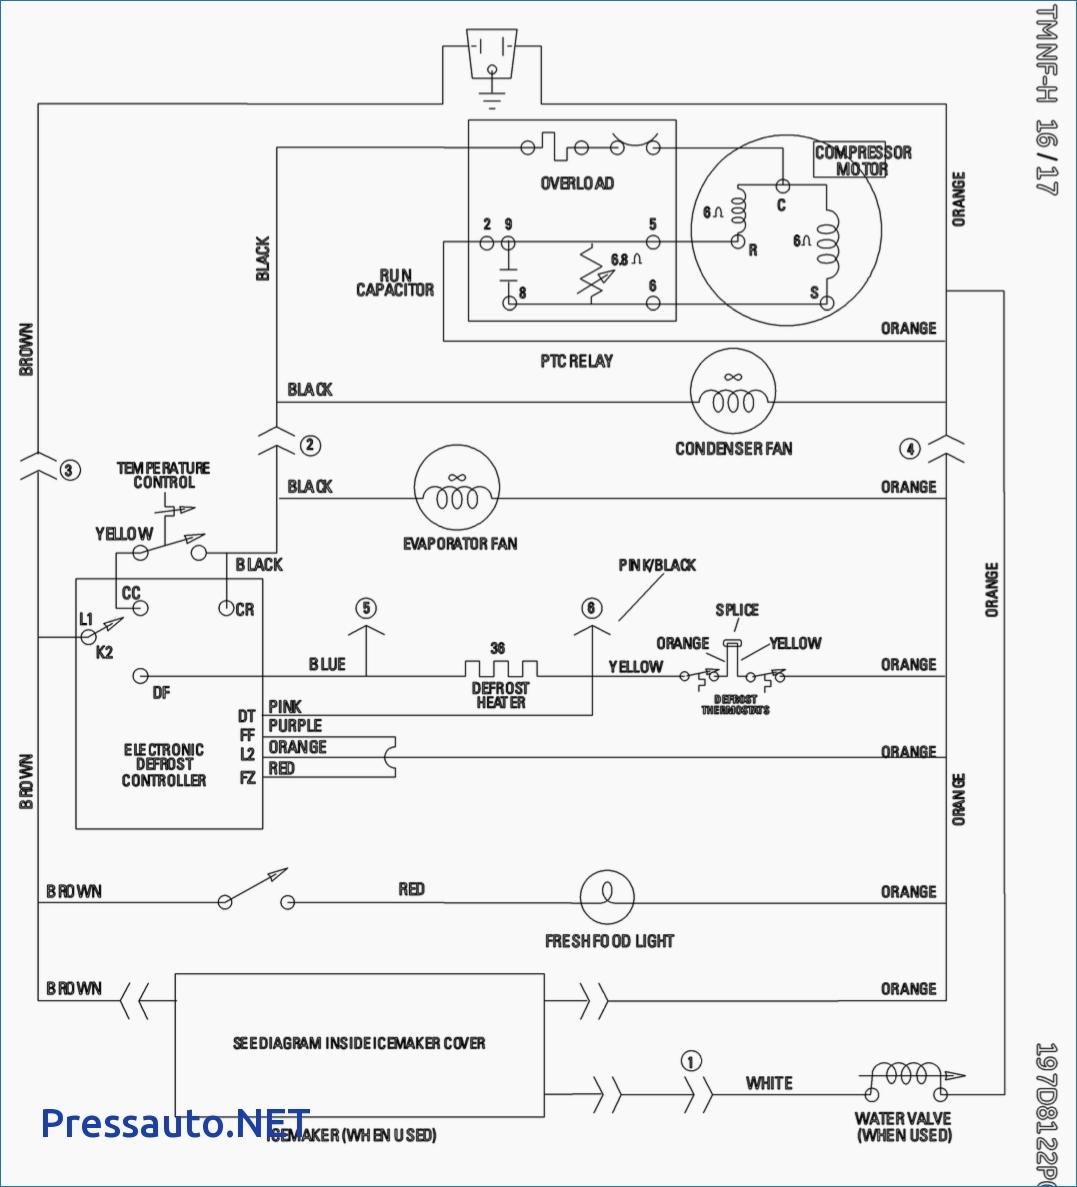 Whirlpool Refrigerator Wiring Diagram Pdf   Bege Wiring DiagramBege Wiring Diagram